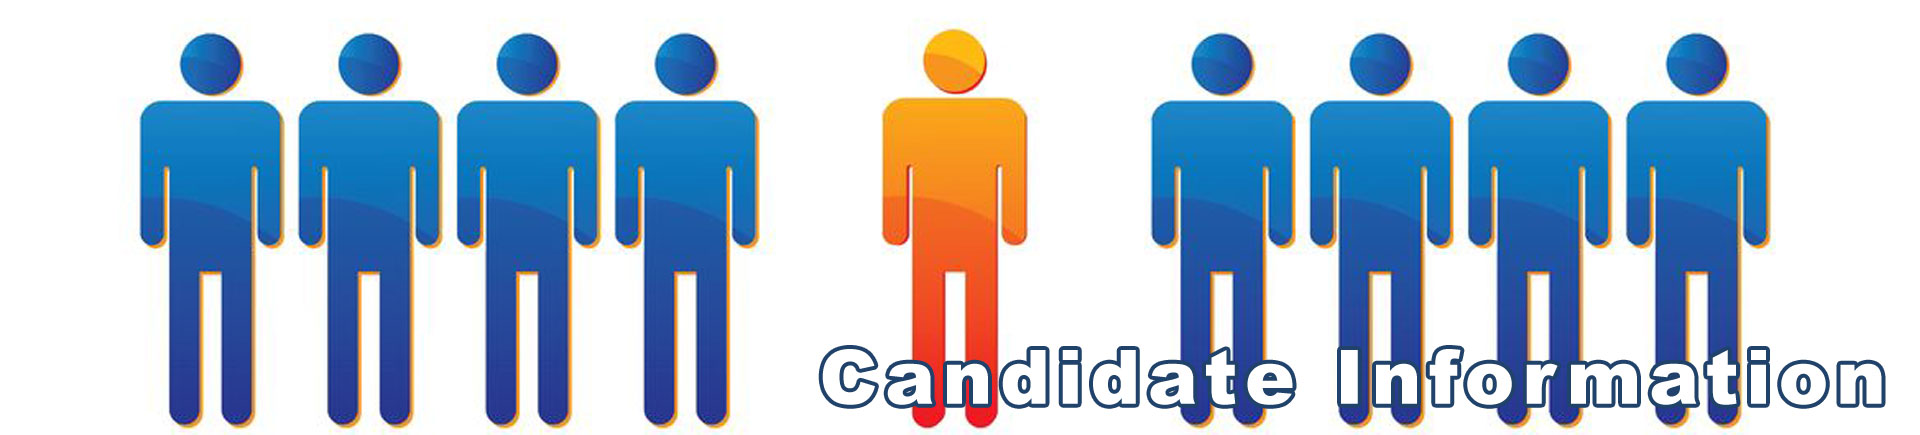 Candidate Information